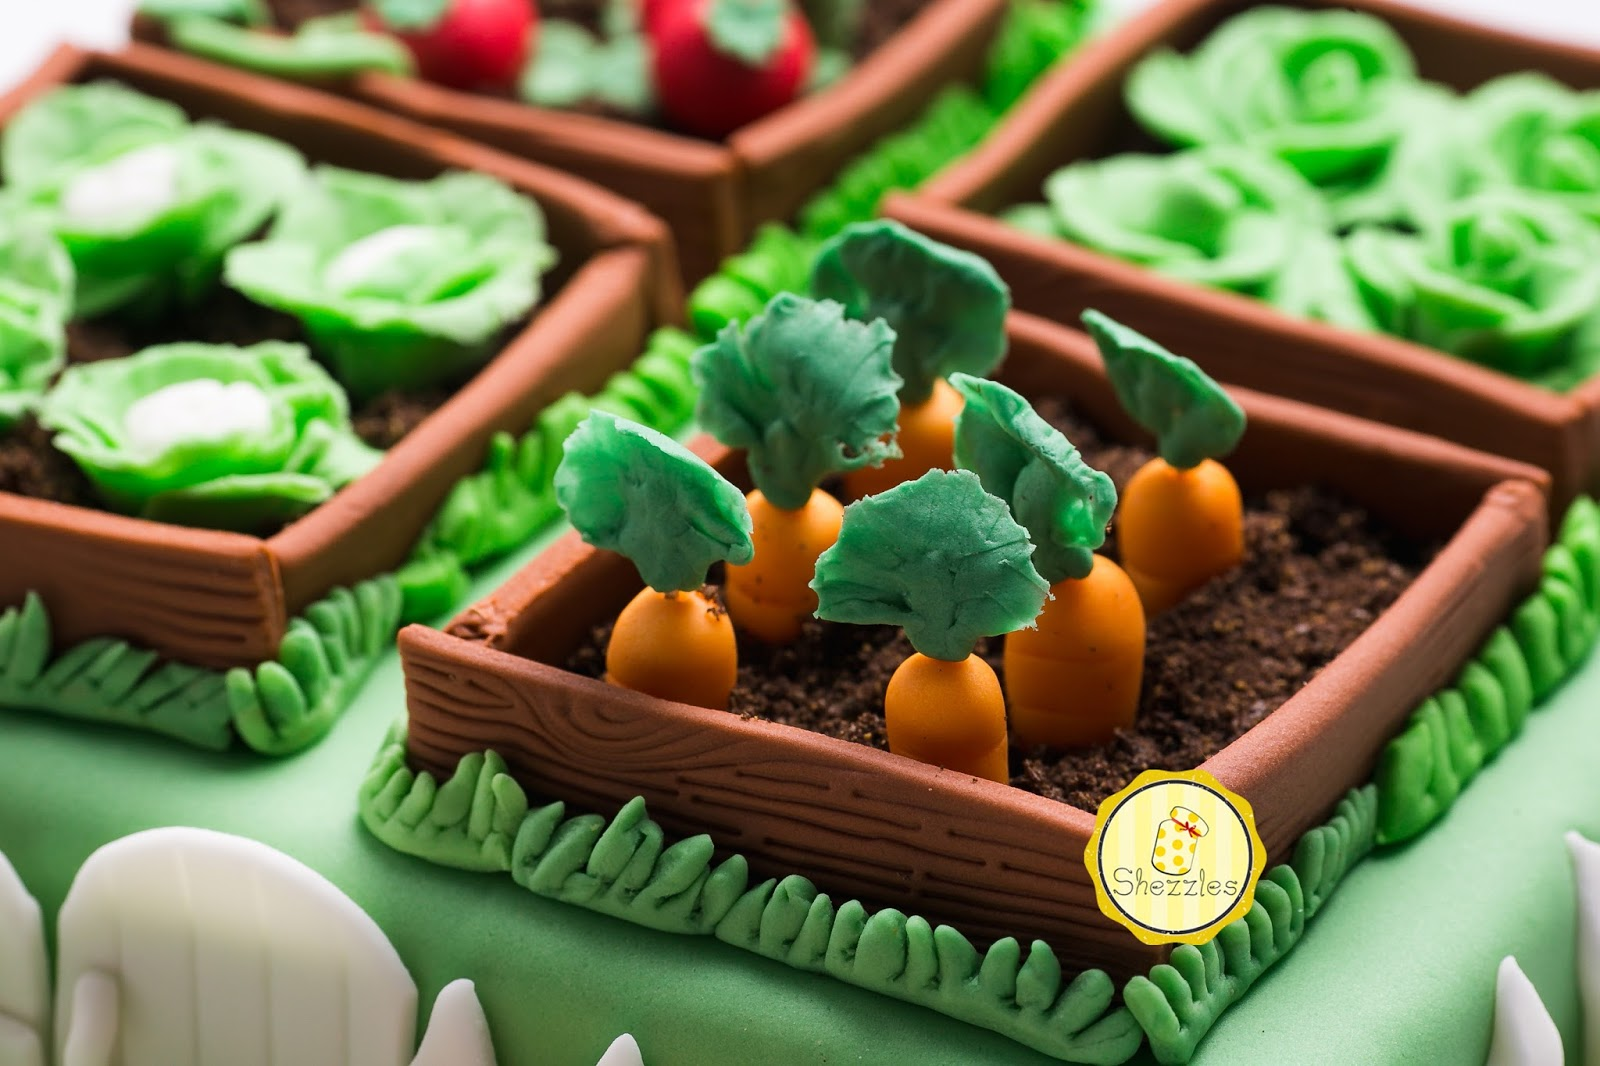 Shezzles   Dessert in a jar: Vegetable Garden Cake